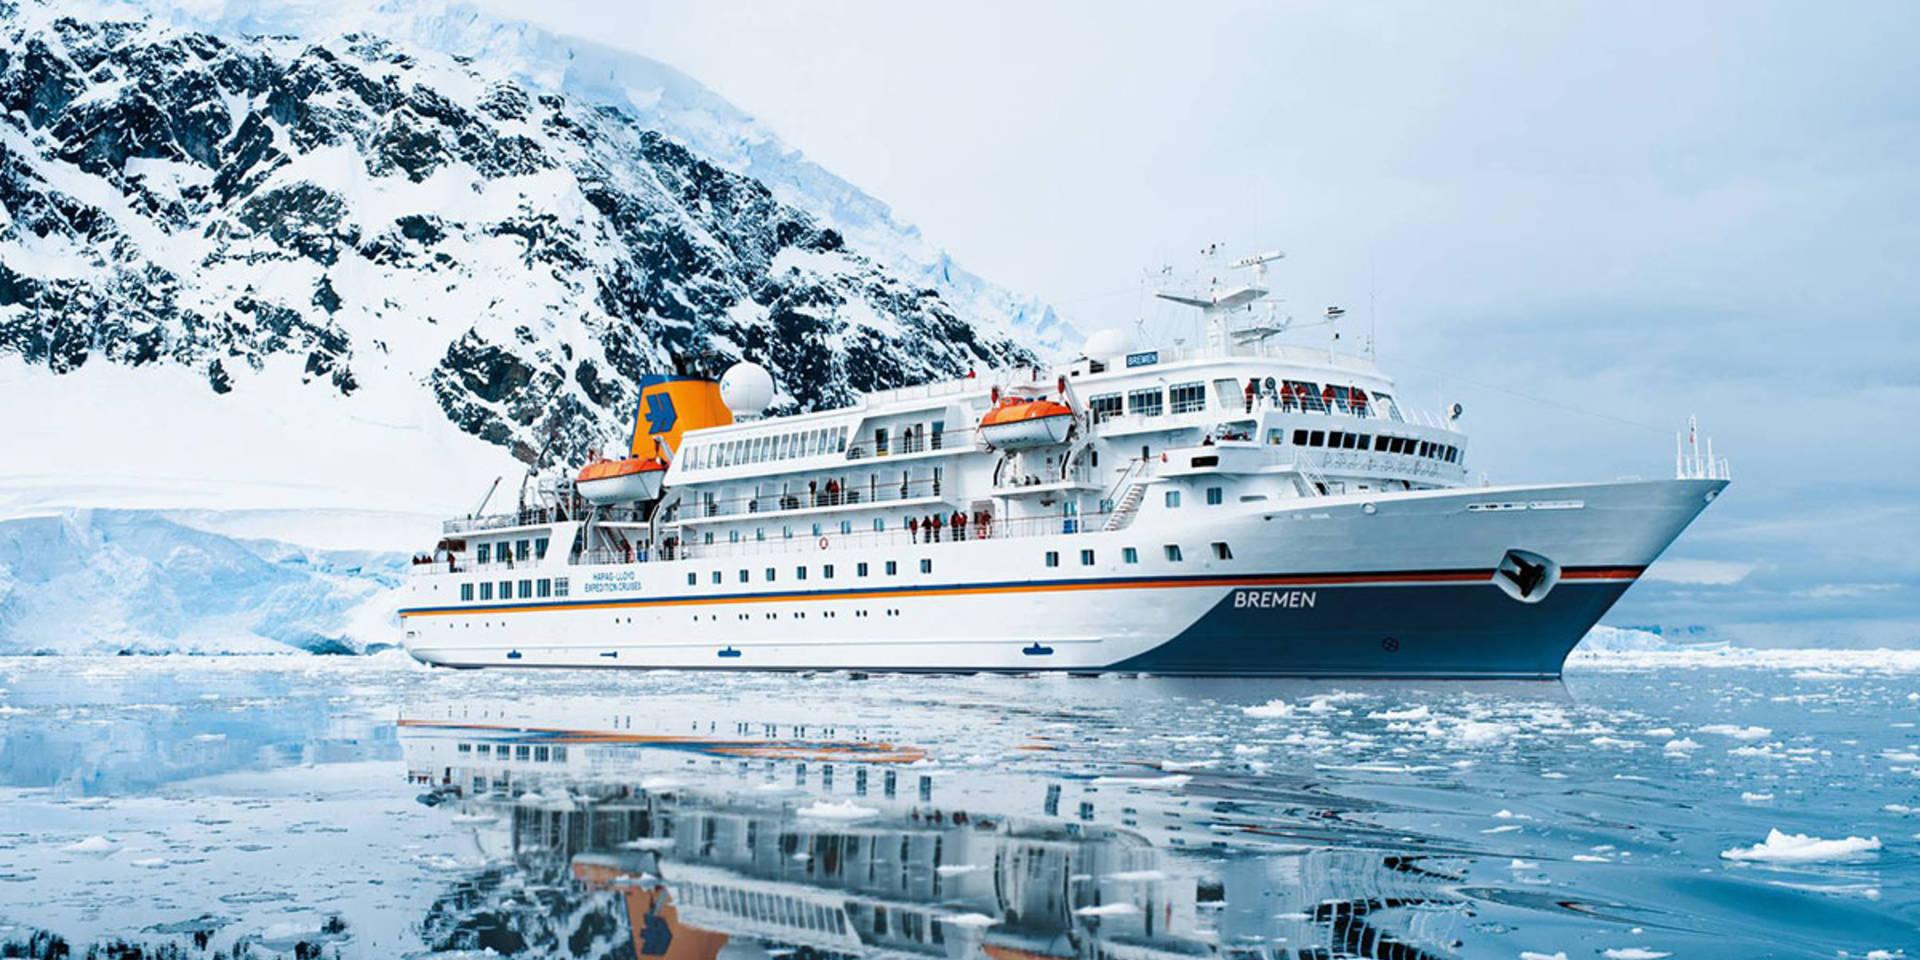 ms bremen hapag lloyd cruises